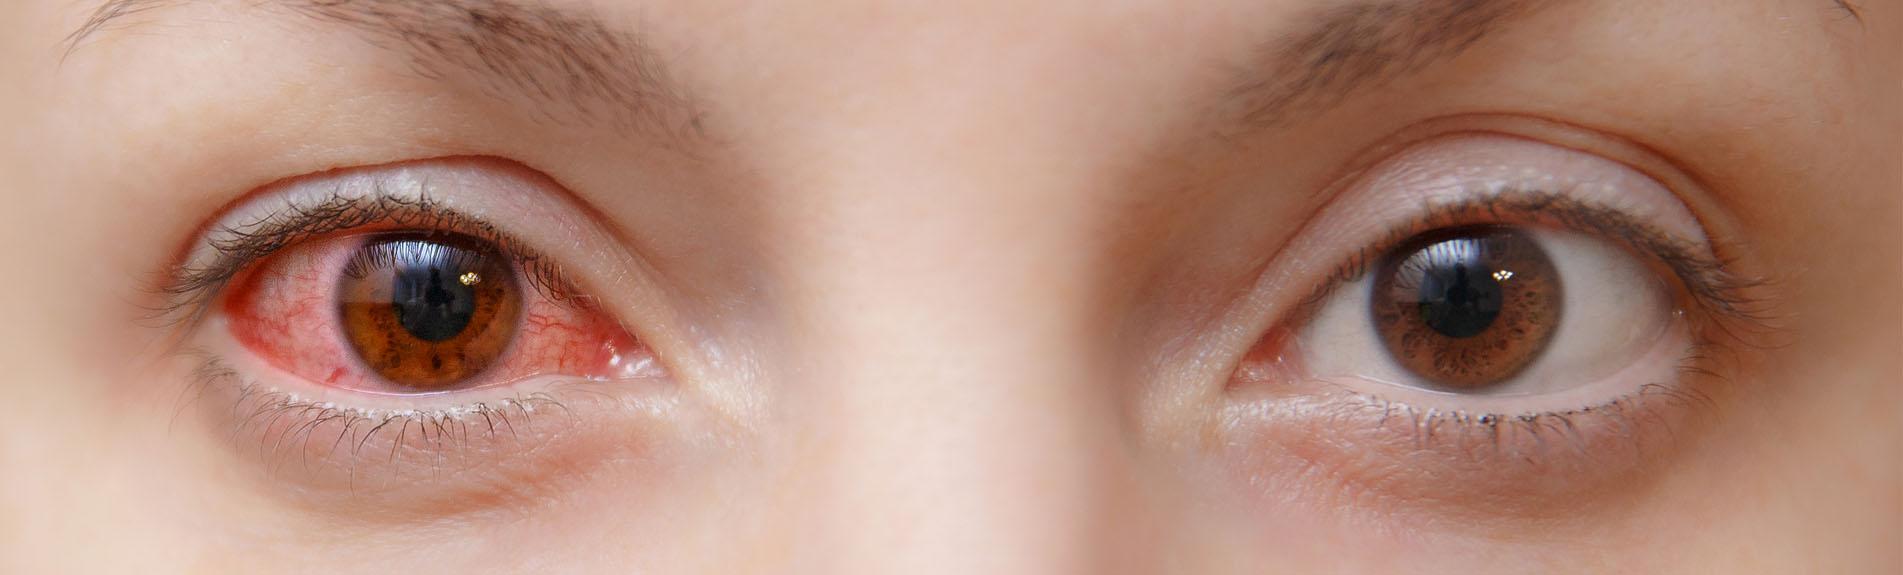 Conjunctivitis Pink Eye Symptoms